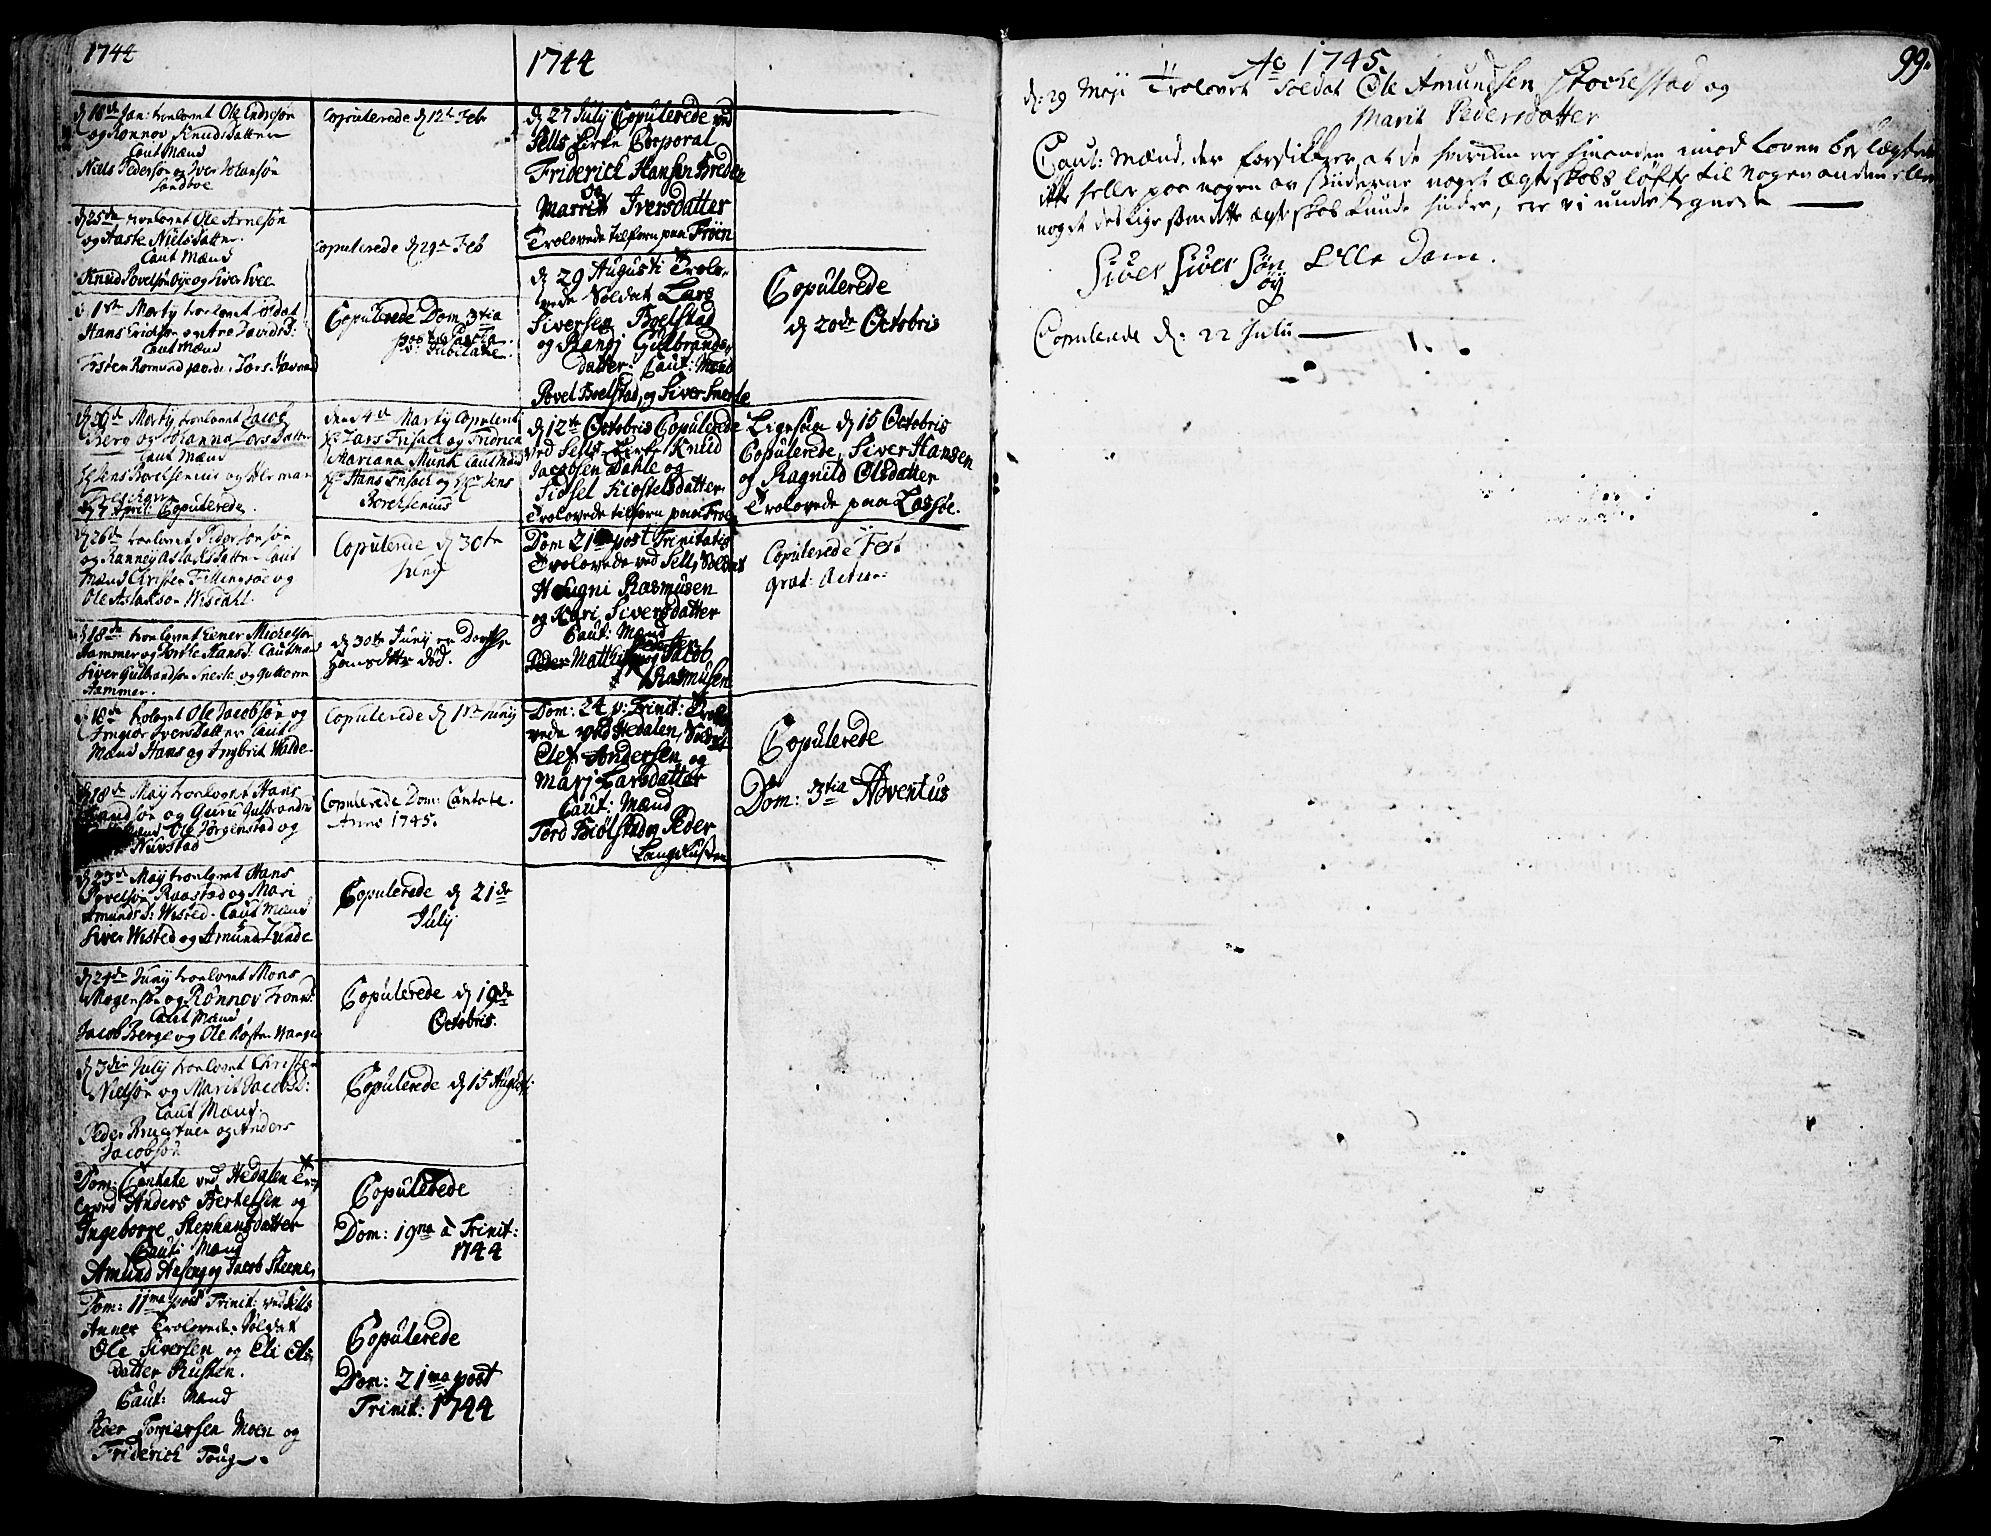 SAH, Vågå prestekontor, Ministerialbok nr. 1, 1739-1810, s. 99